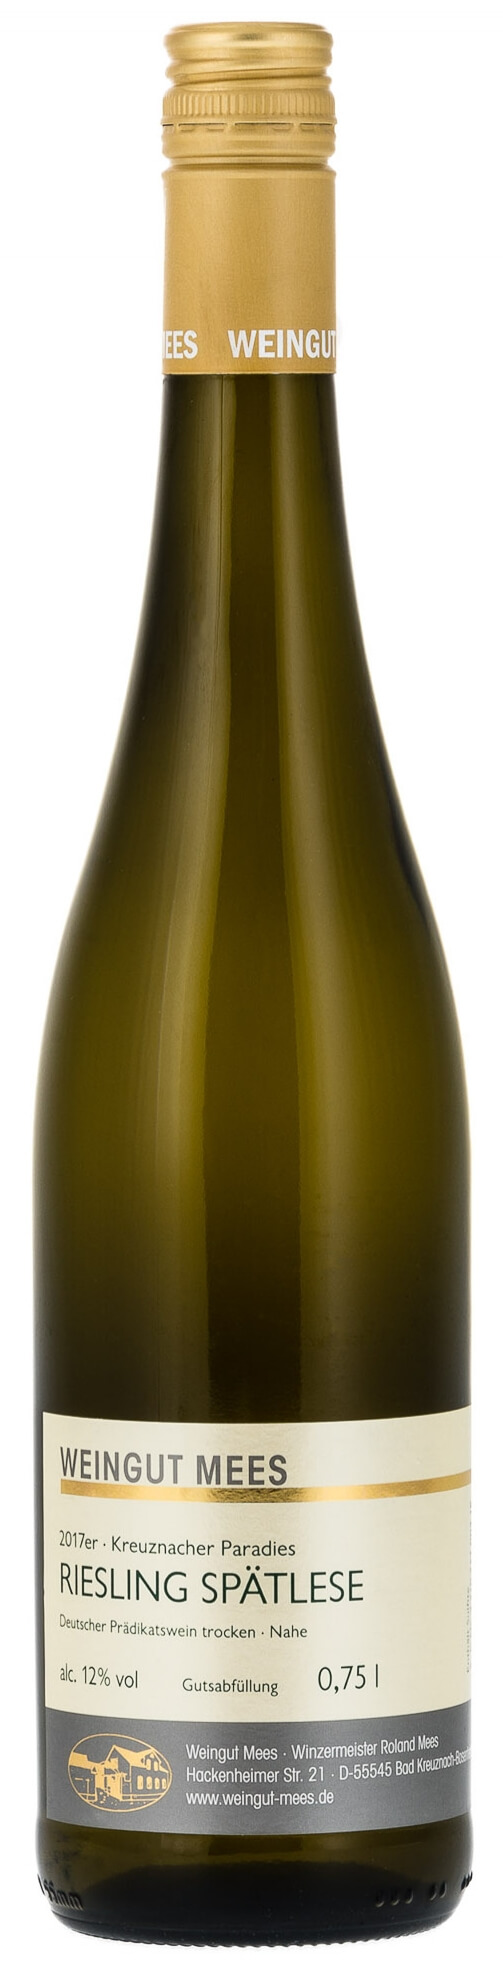 Riesling Spätlese trocken Kreuznacher Paradies Weißwein 2018 / Mees